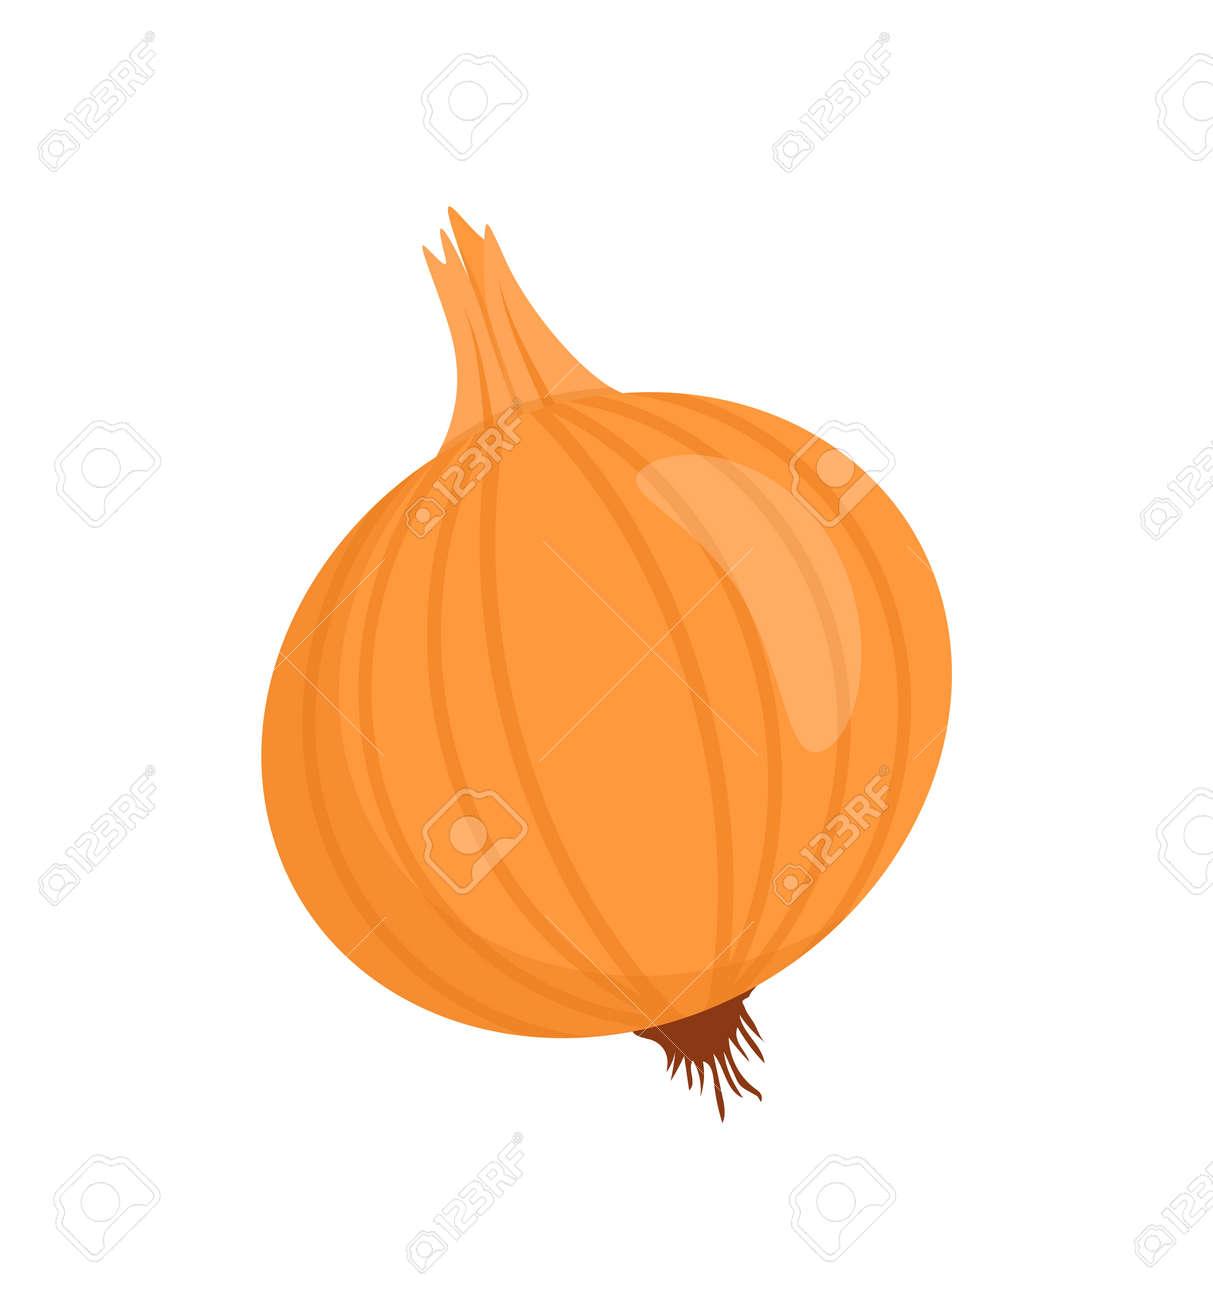 Onion Isolated Vegetable Cartoon Vector Badge - 113273314